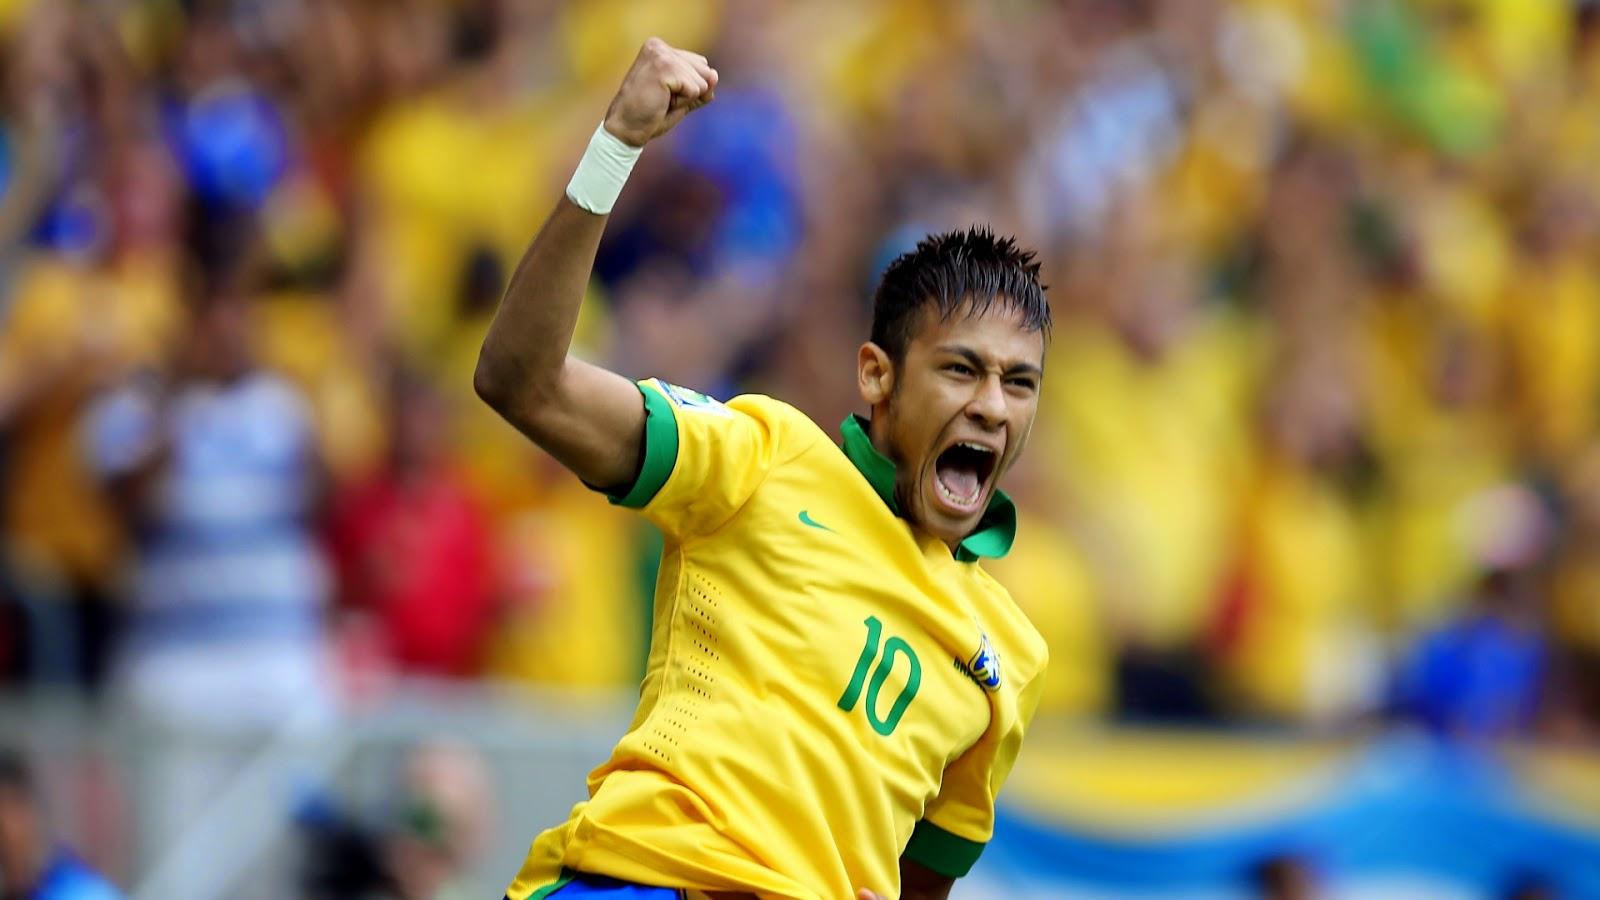 Hd Images Of Neymar: ALL SPORTS PLAYERS: Neymar Jr Hd Wallpapers 2014